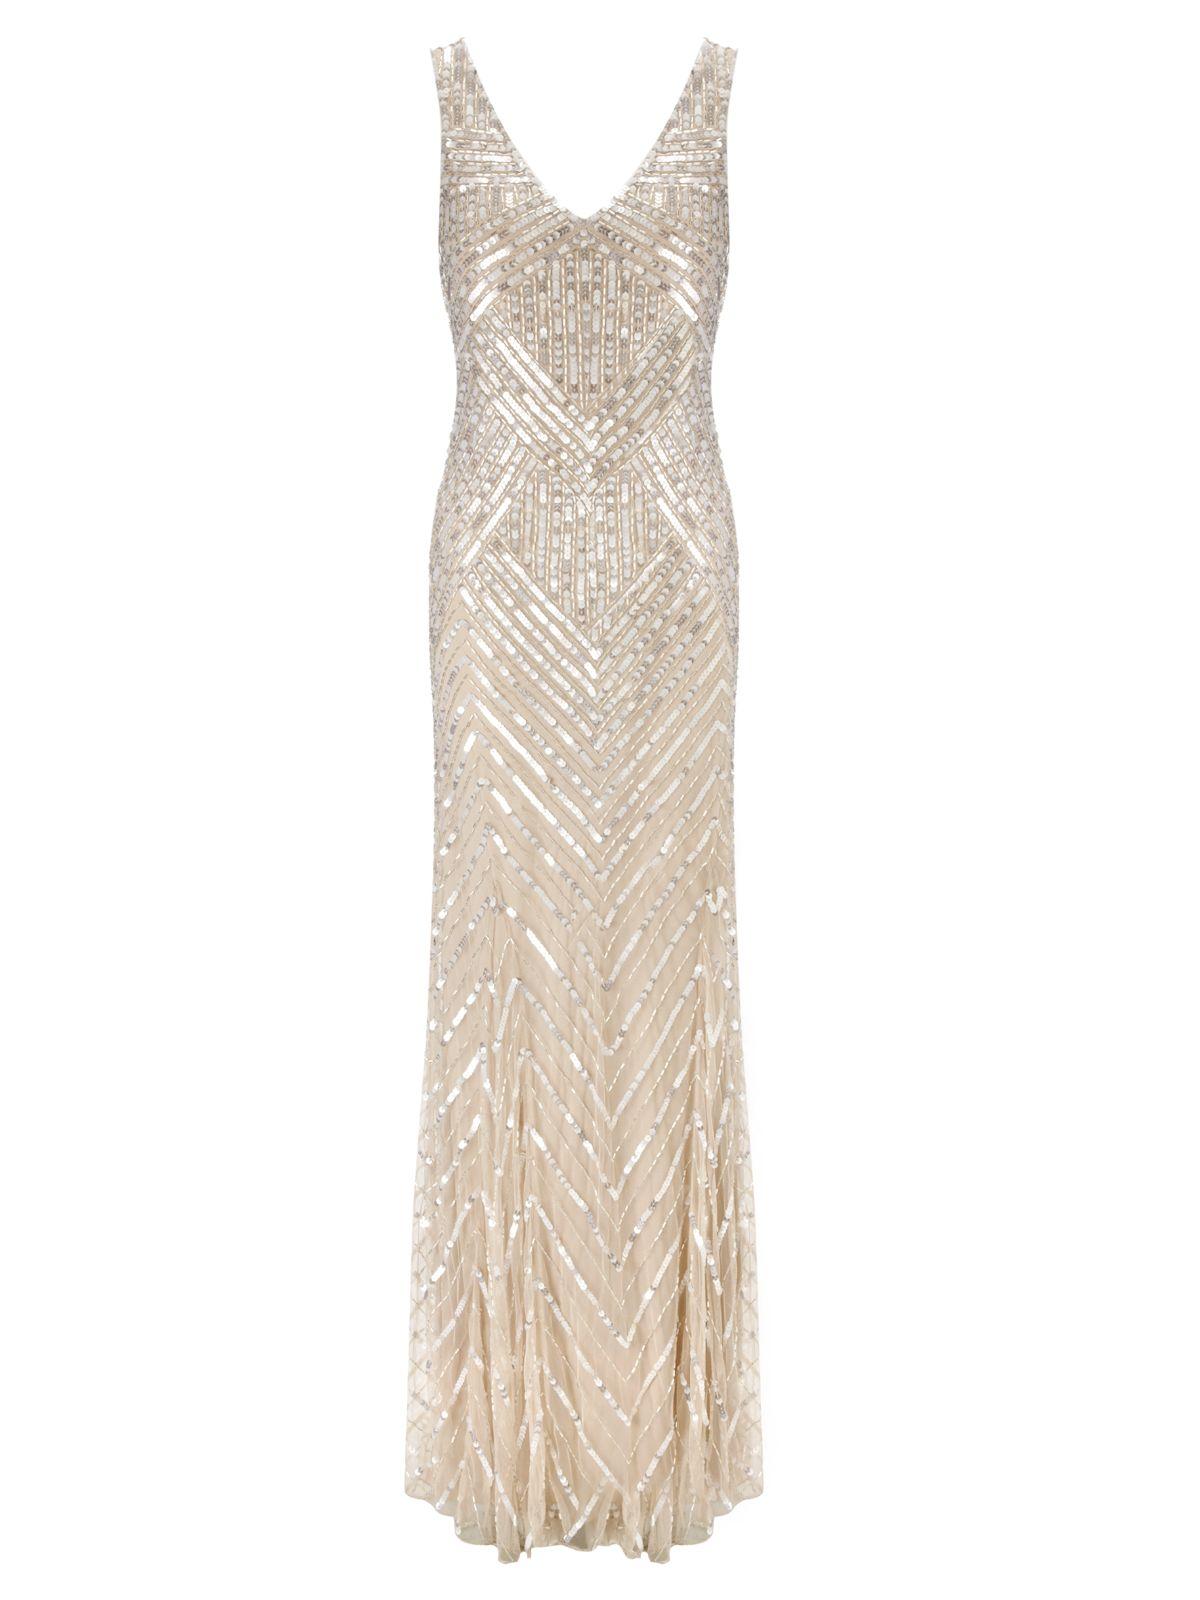 1920s Evening Dresses For Sale Uk - Plus Size Tops